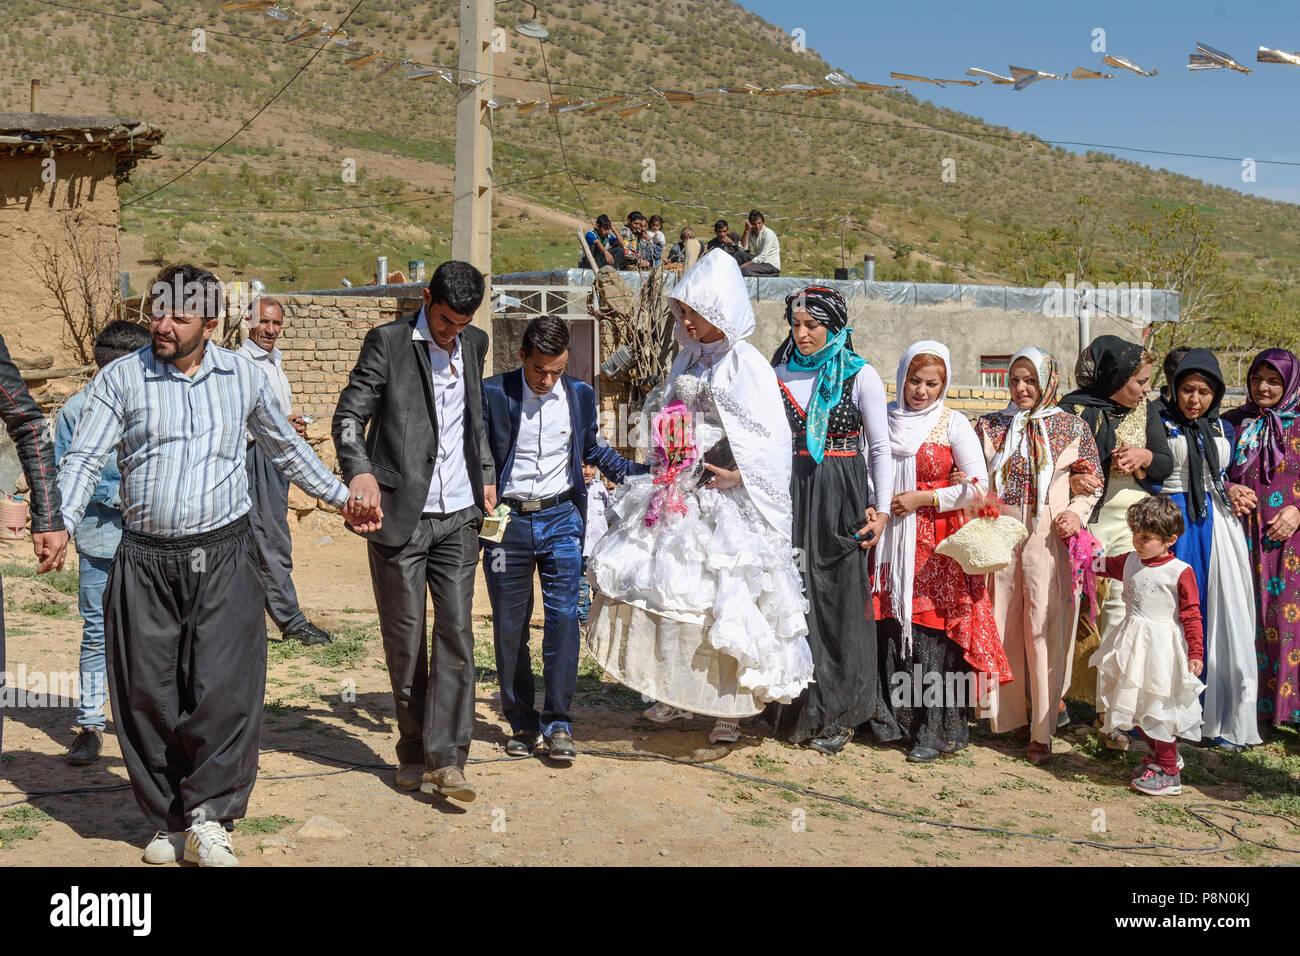 Lorestan Province, Iran - April 1, 2018: Lurish wedding ceremony in the village. - Stock Image